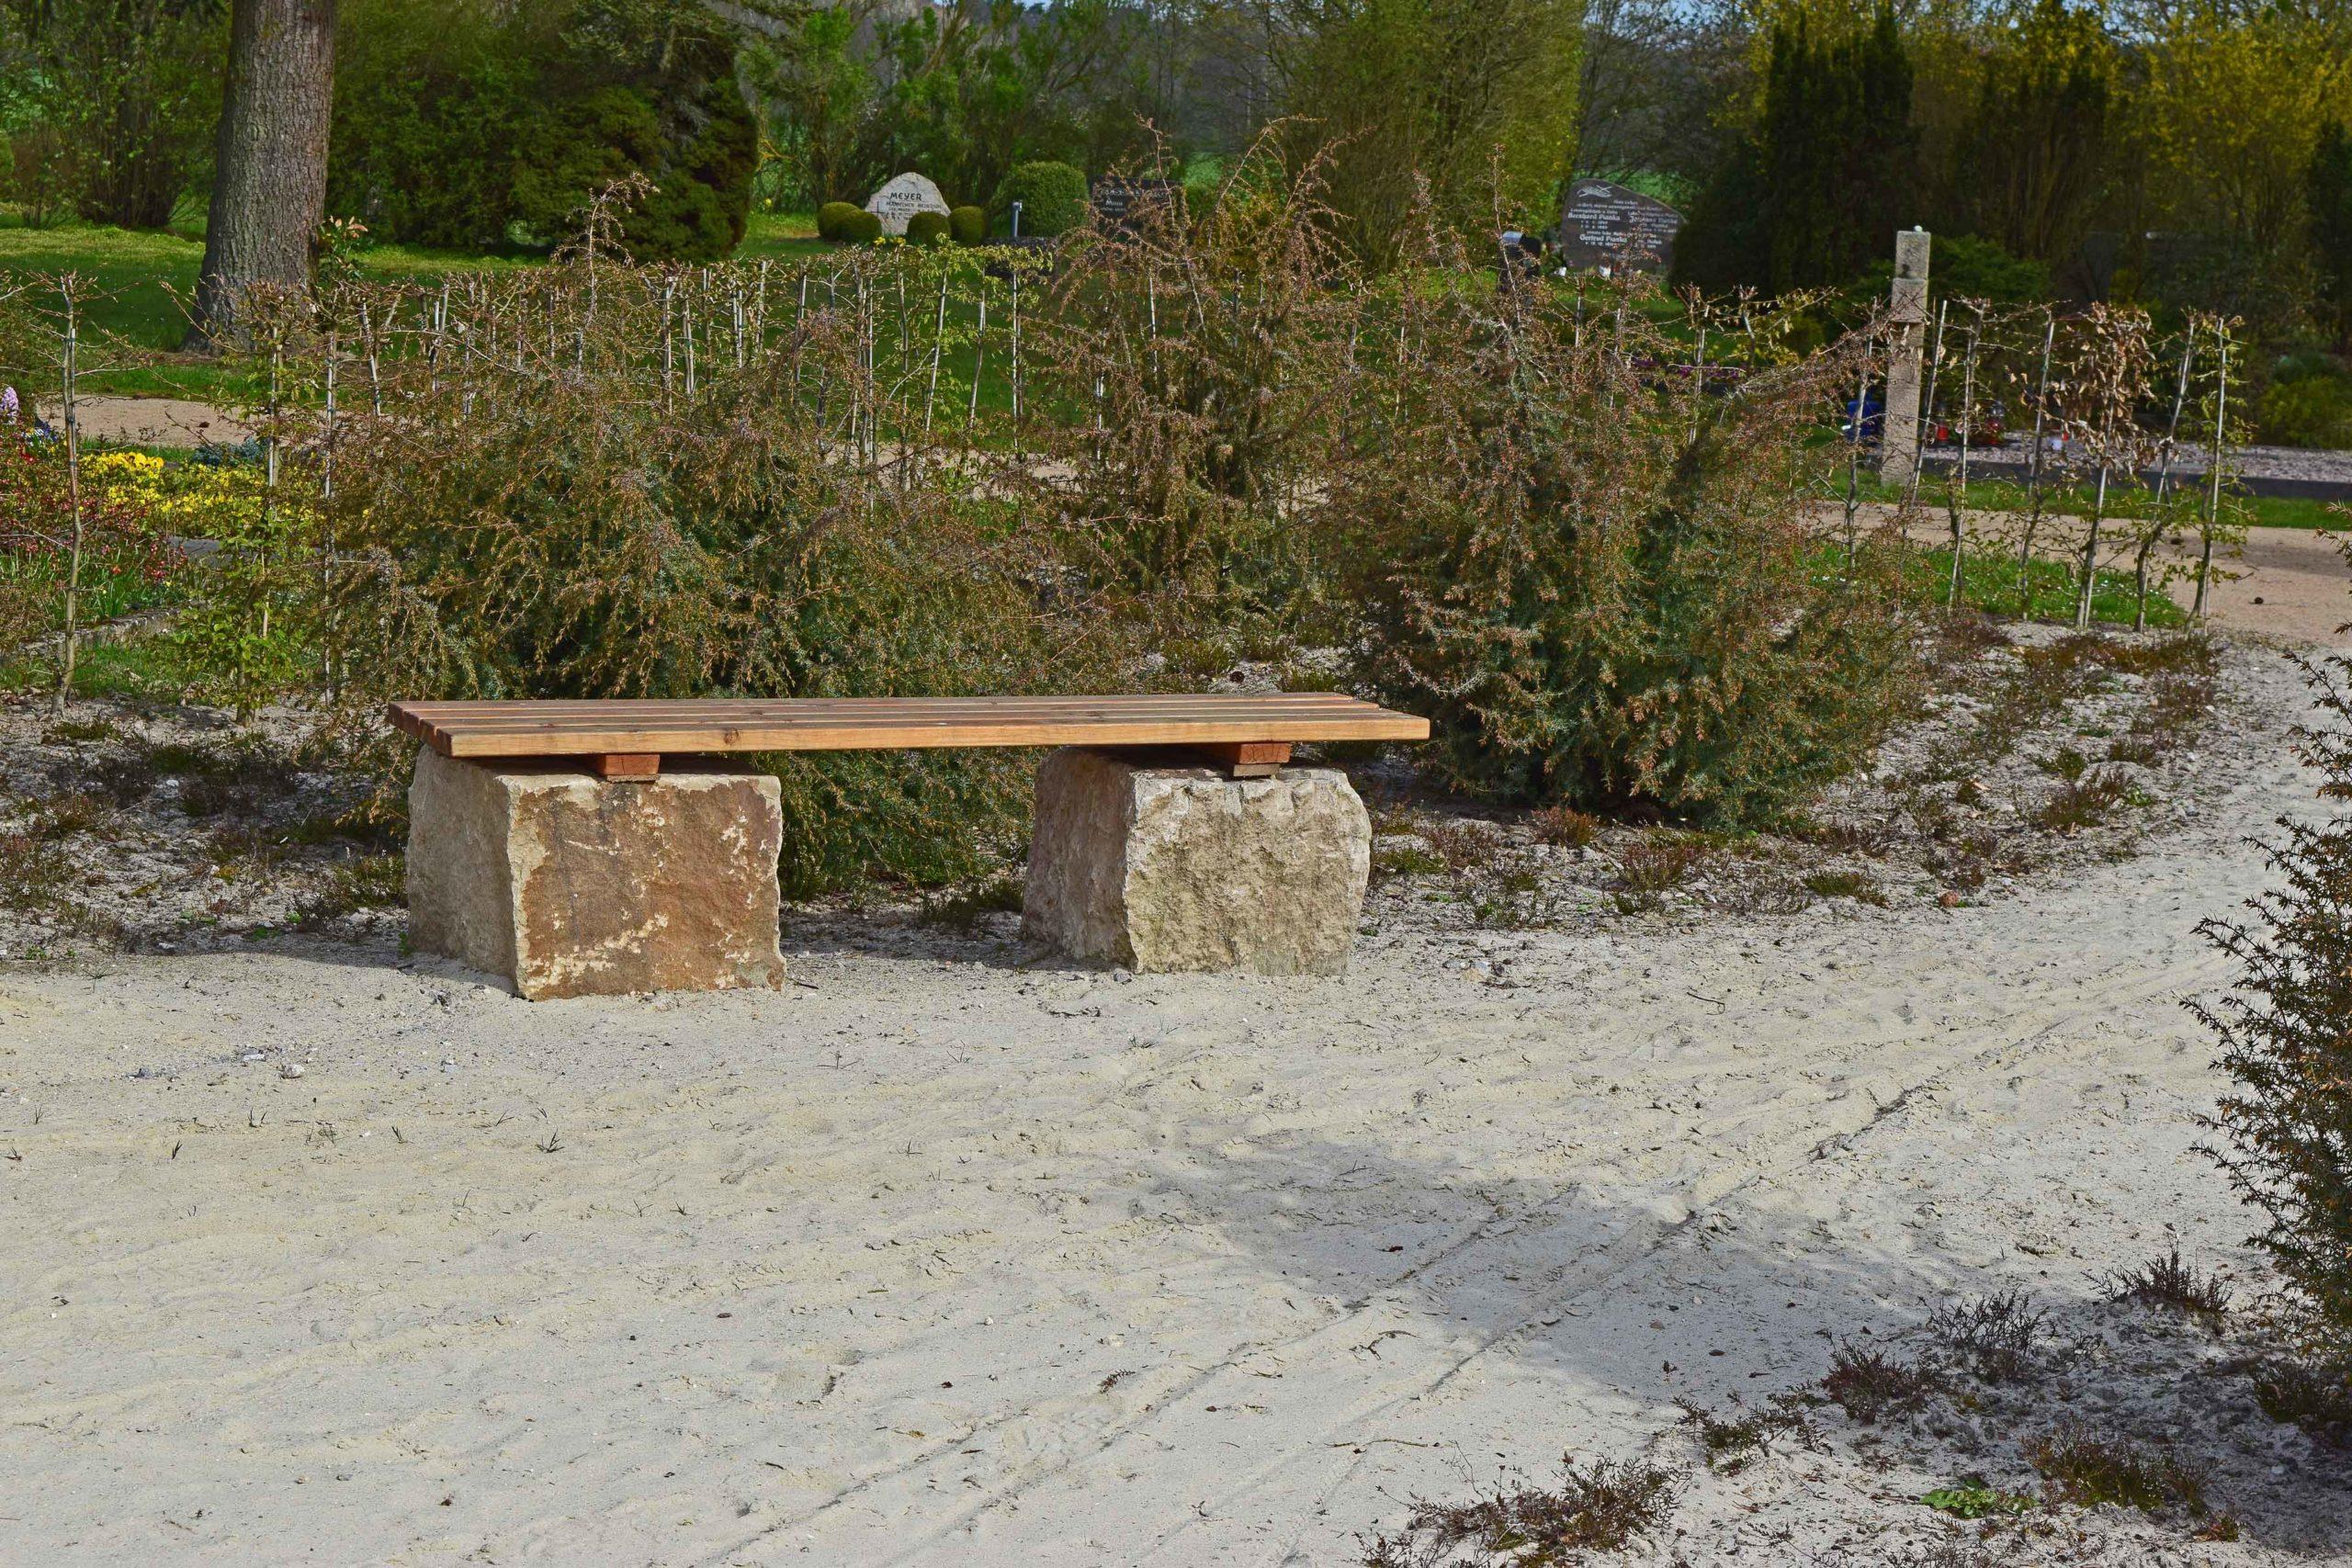 Sitzbank in der Heidefläche